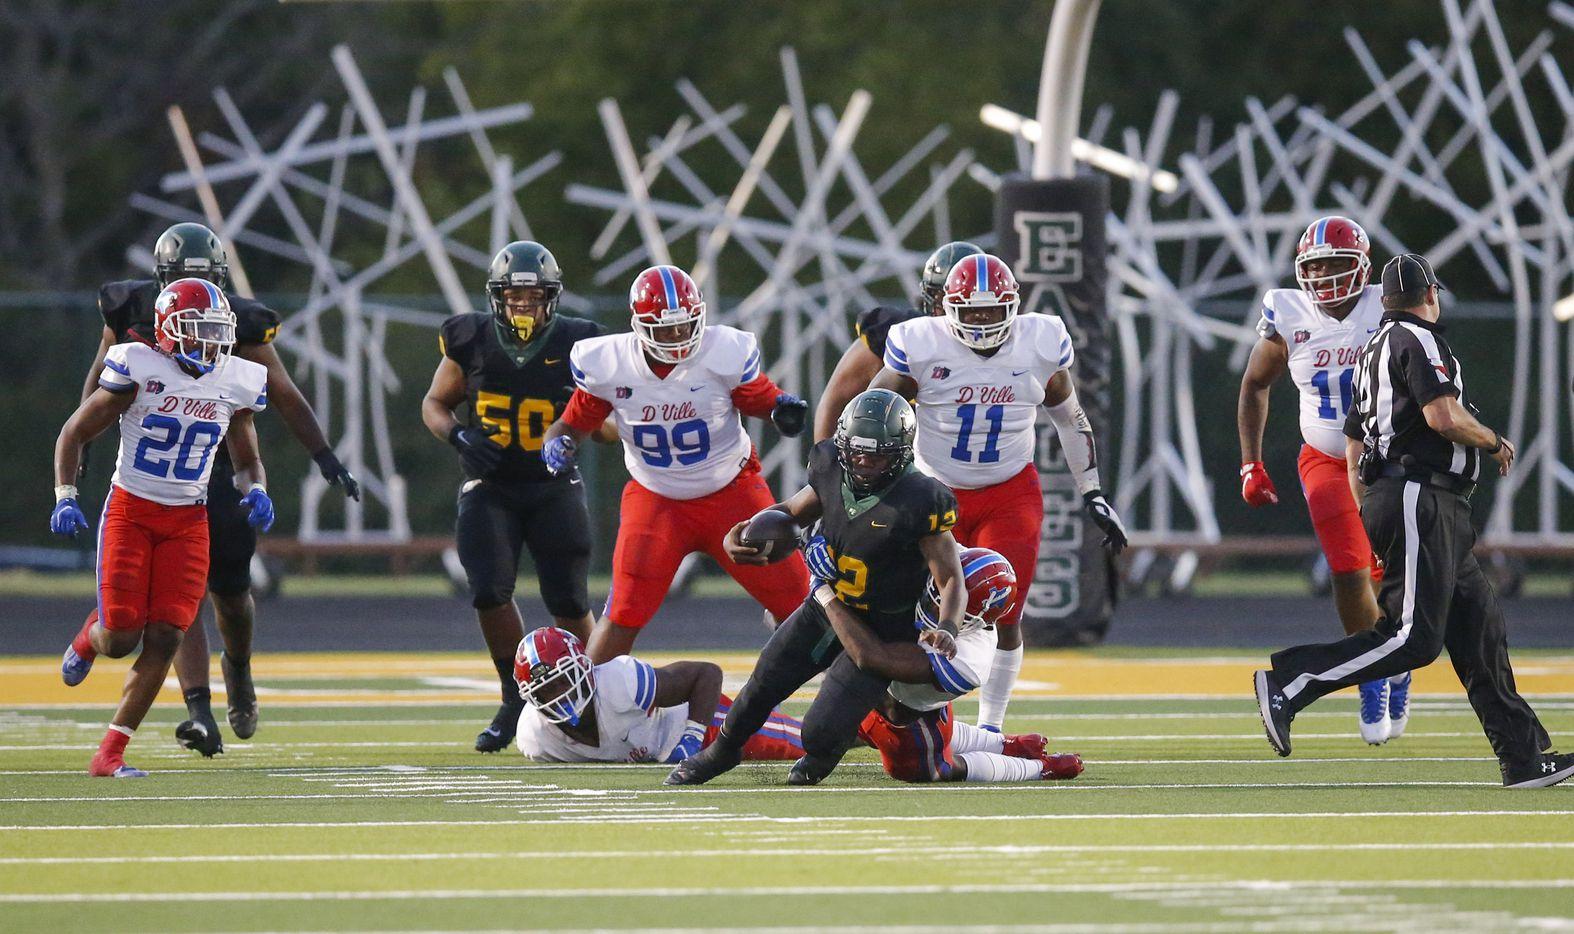 DeSoto senior quarterback Matt Allen (12) is tackled by Duncanville senior linebacker Jordan Crook (2) during the first half of a high school football game at DeSoto High School, Friday, September 17, 2021. (Brandon Wade/Special Contributor)